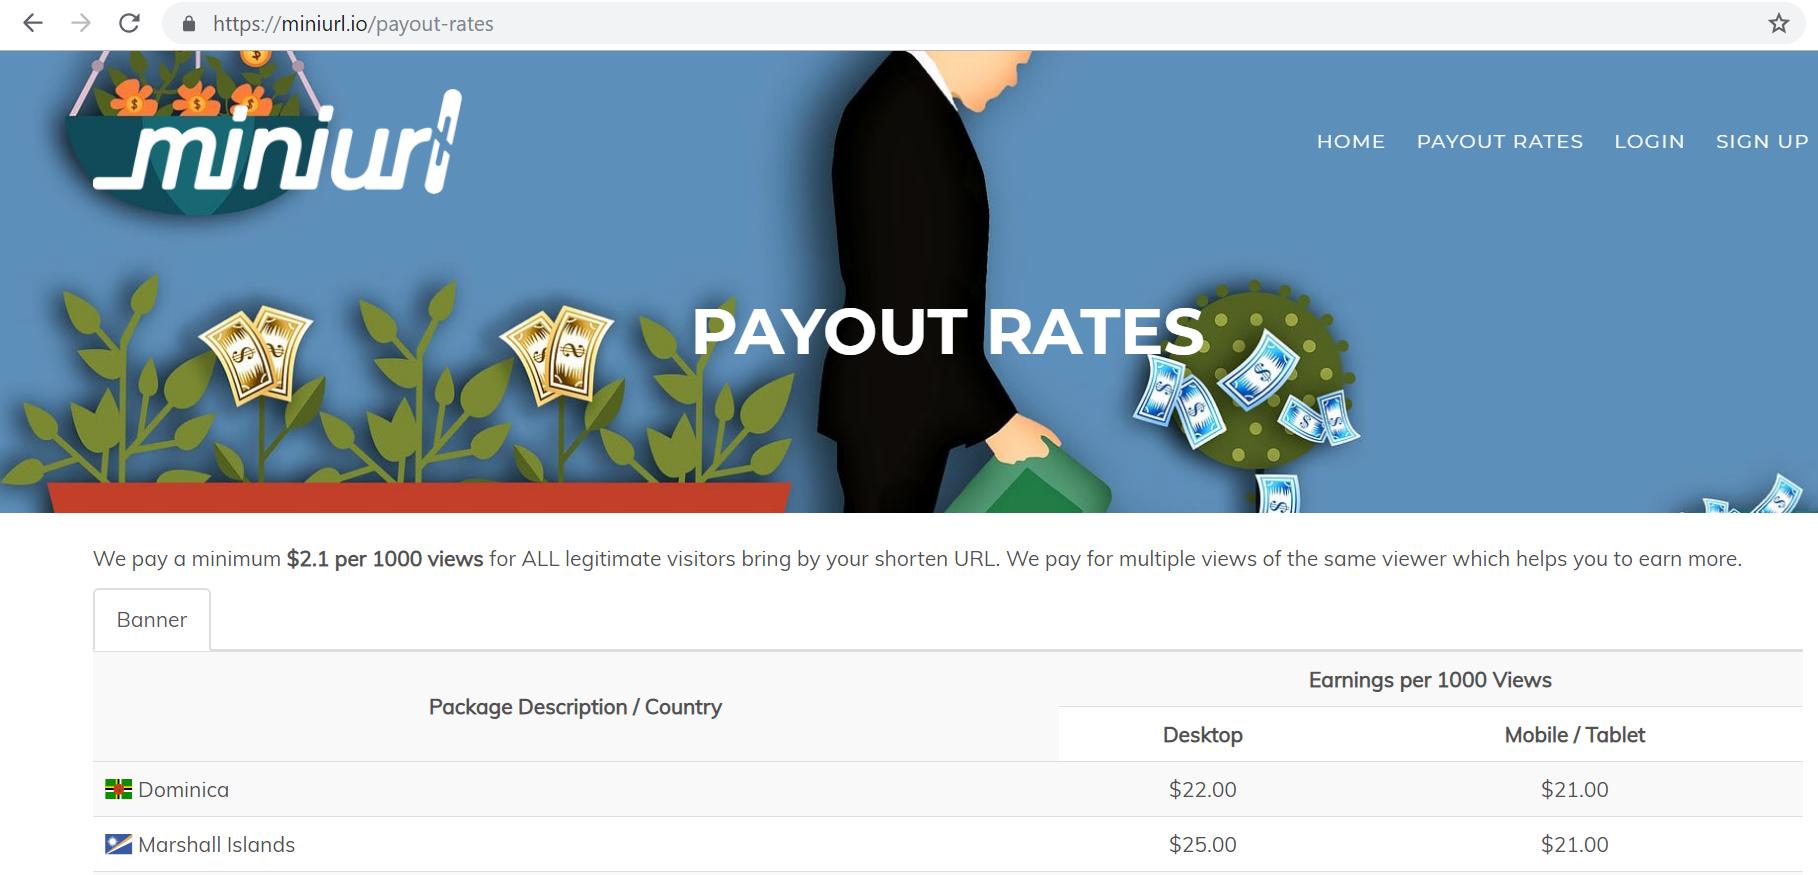 Miniurl Payout rates